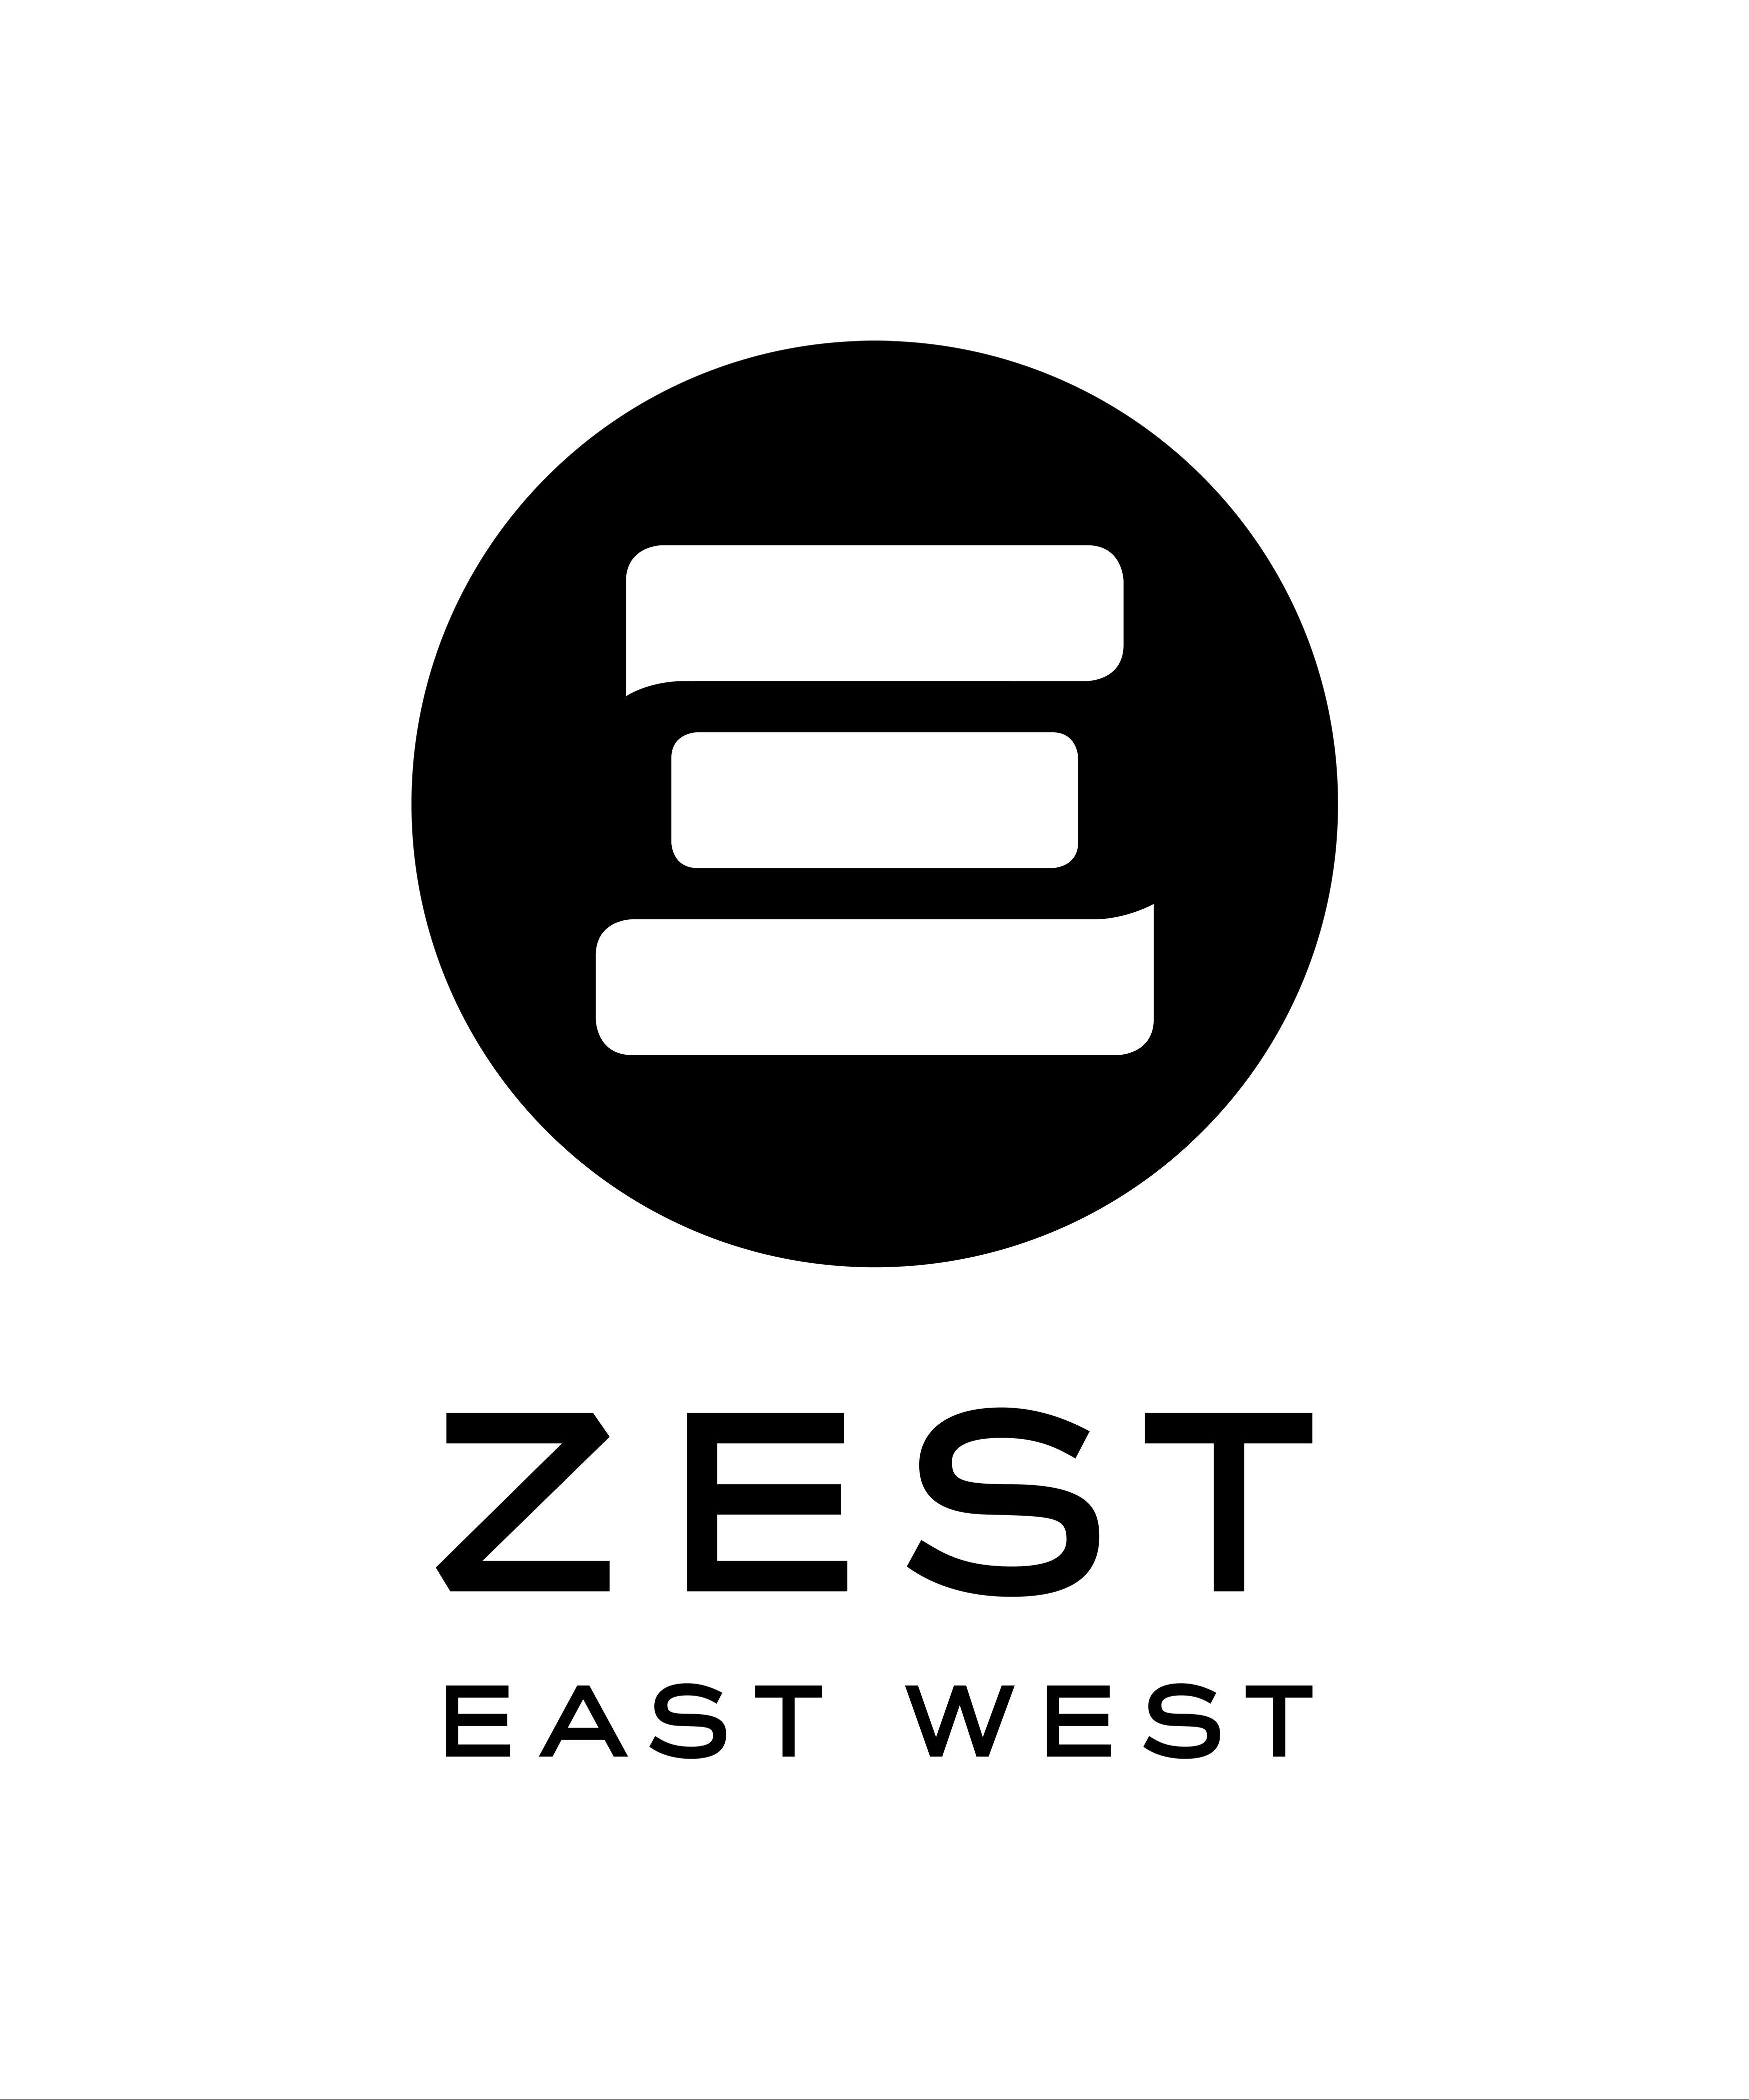 Zest East West